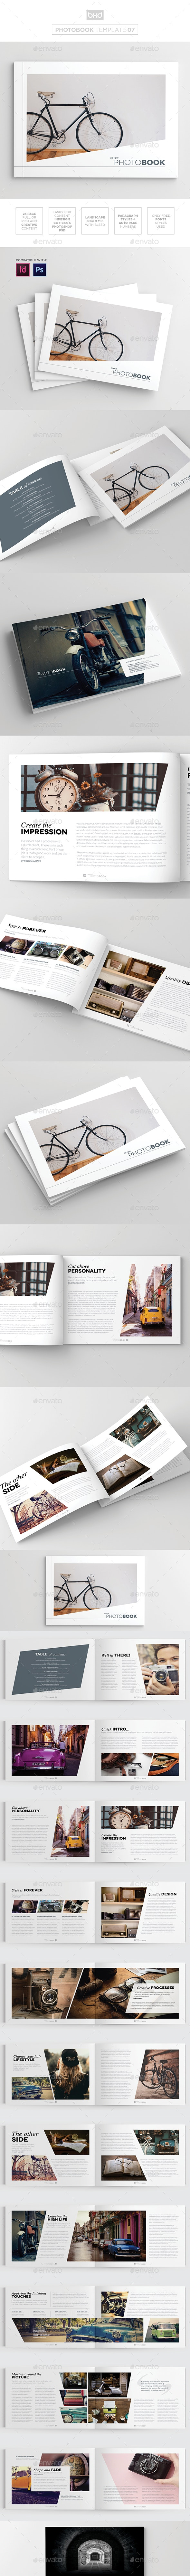 Magazine/Lookbook Template InDesign & Photoshop 07 - Magazines Print Templates